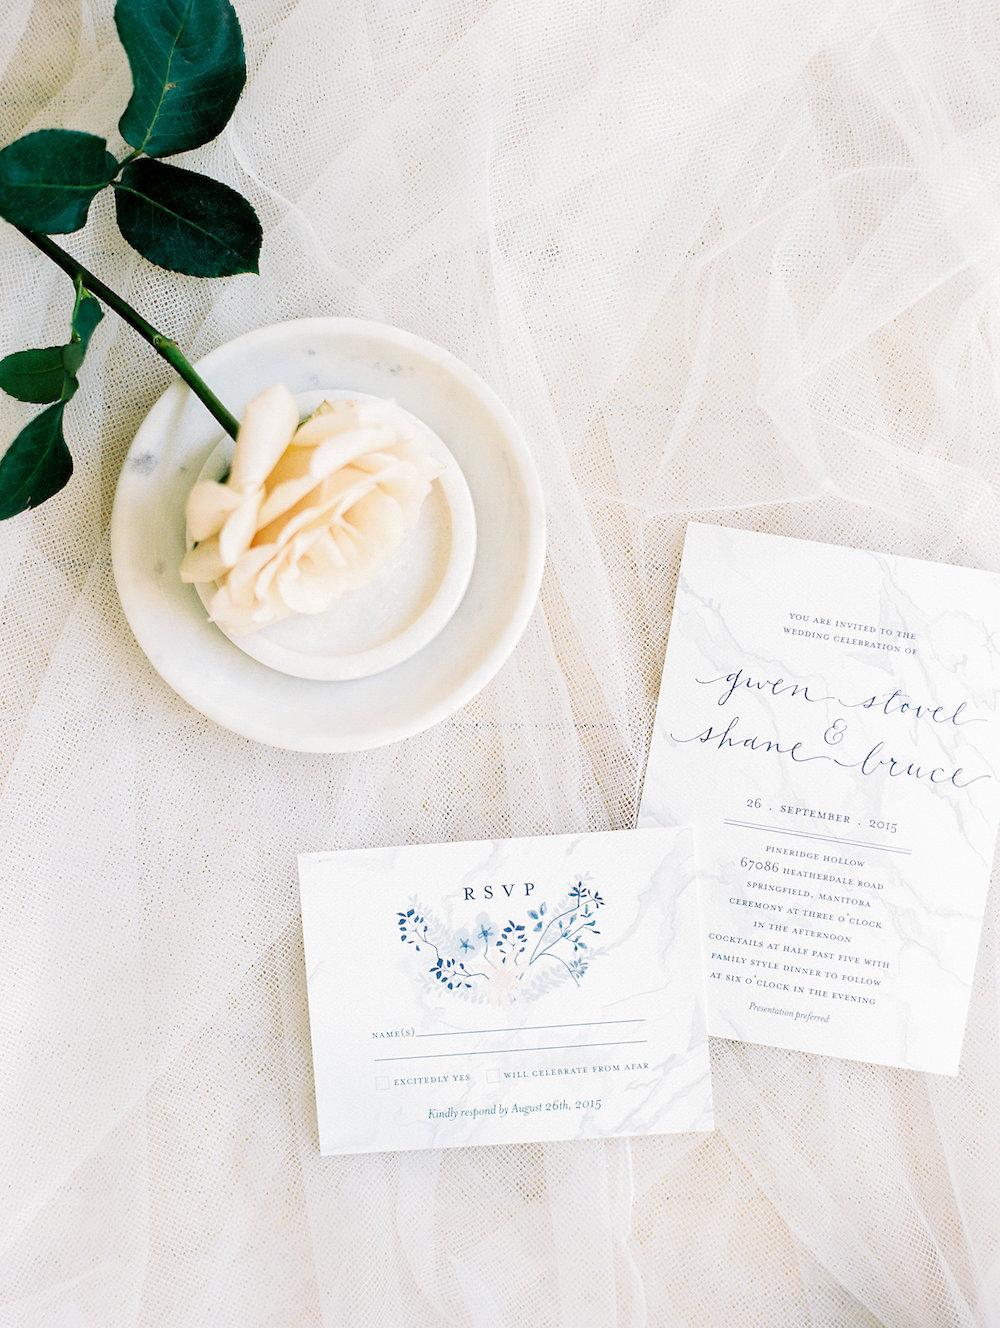 wedding invitations - stone house creative